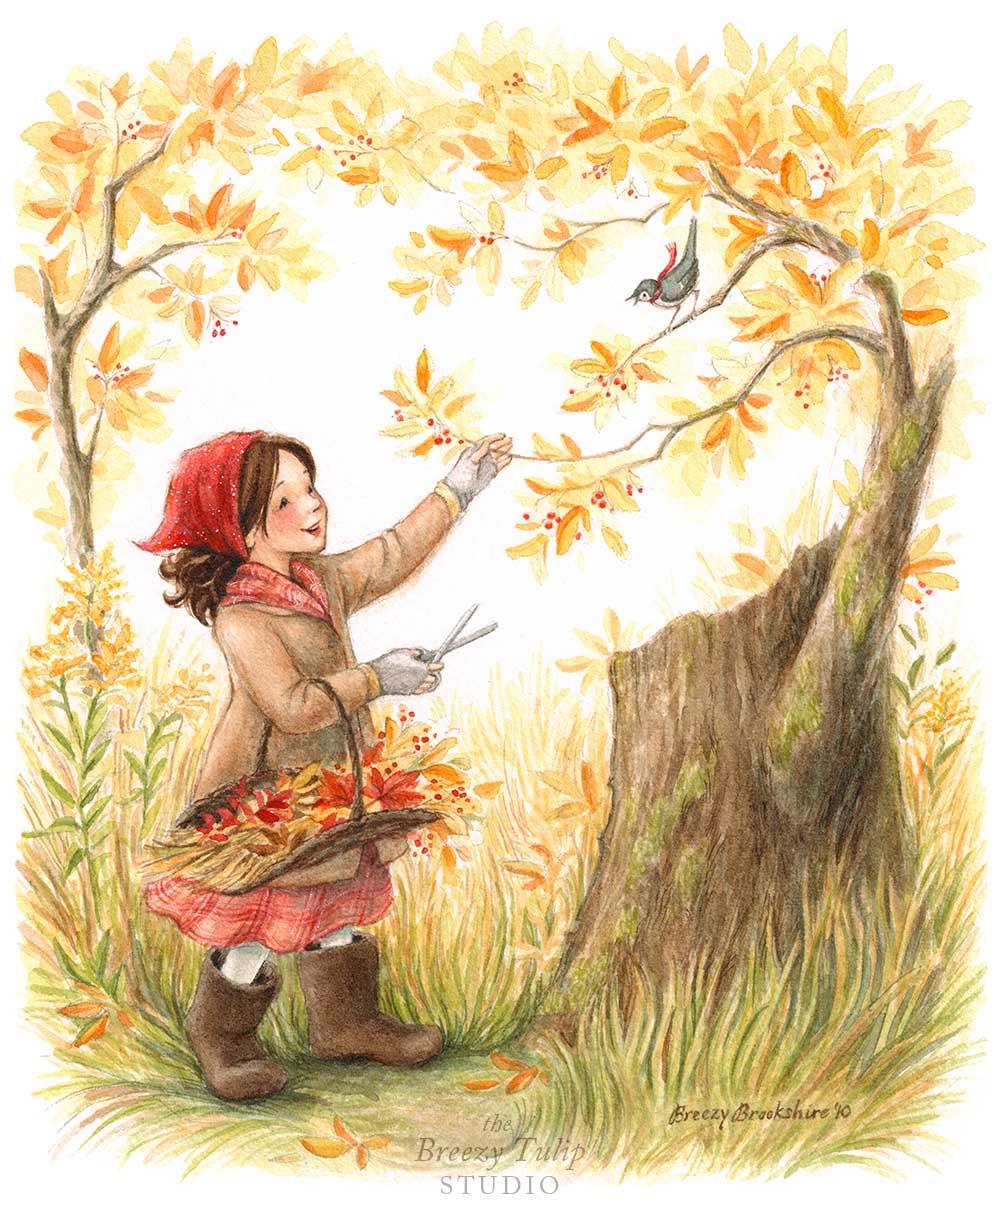 Gathering-Autumn-Joys-by-Breezy-Brookshire